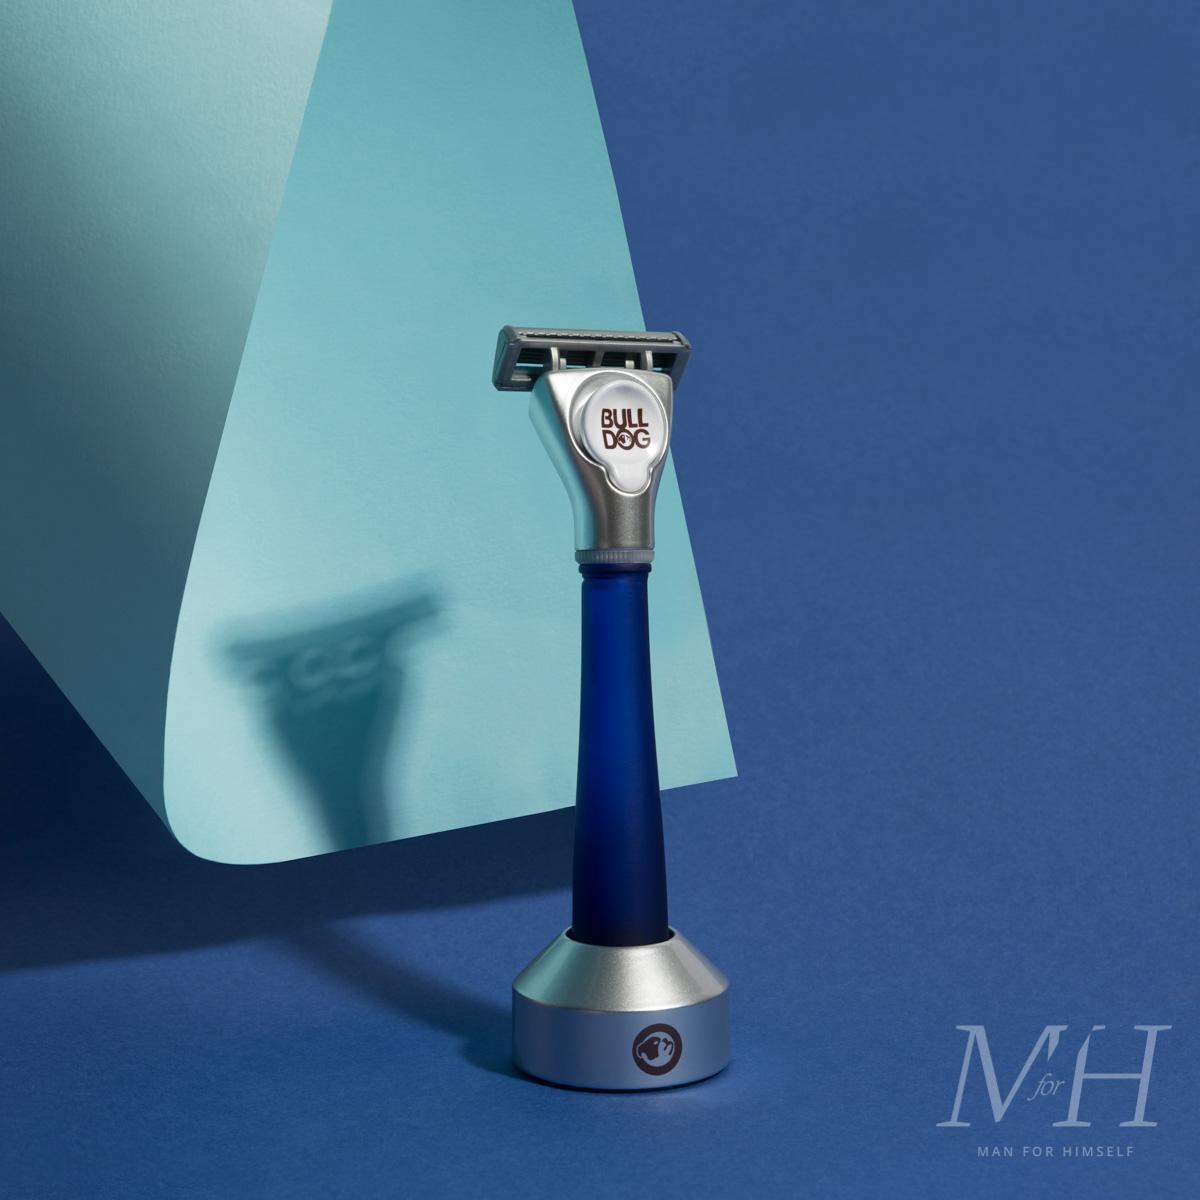 bulldog-skincare-glass-razor-blue-shaving-grooming-product-review-man-for-himself-2